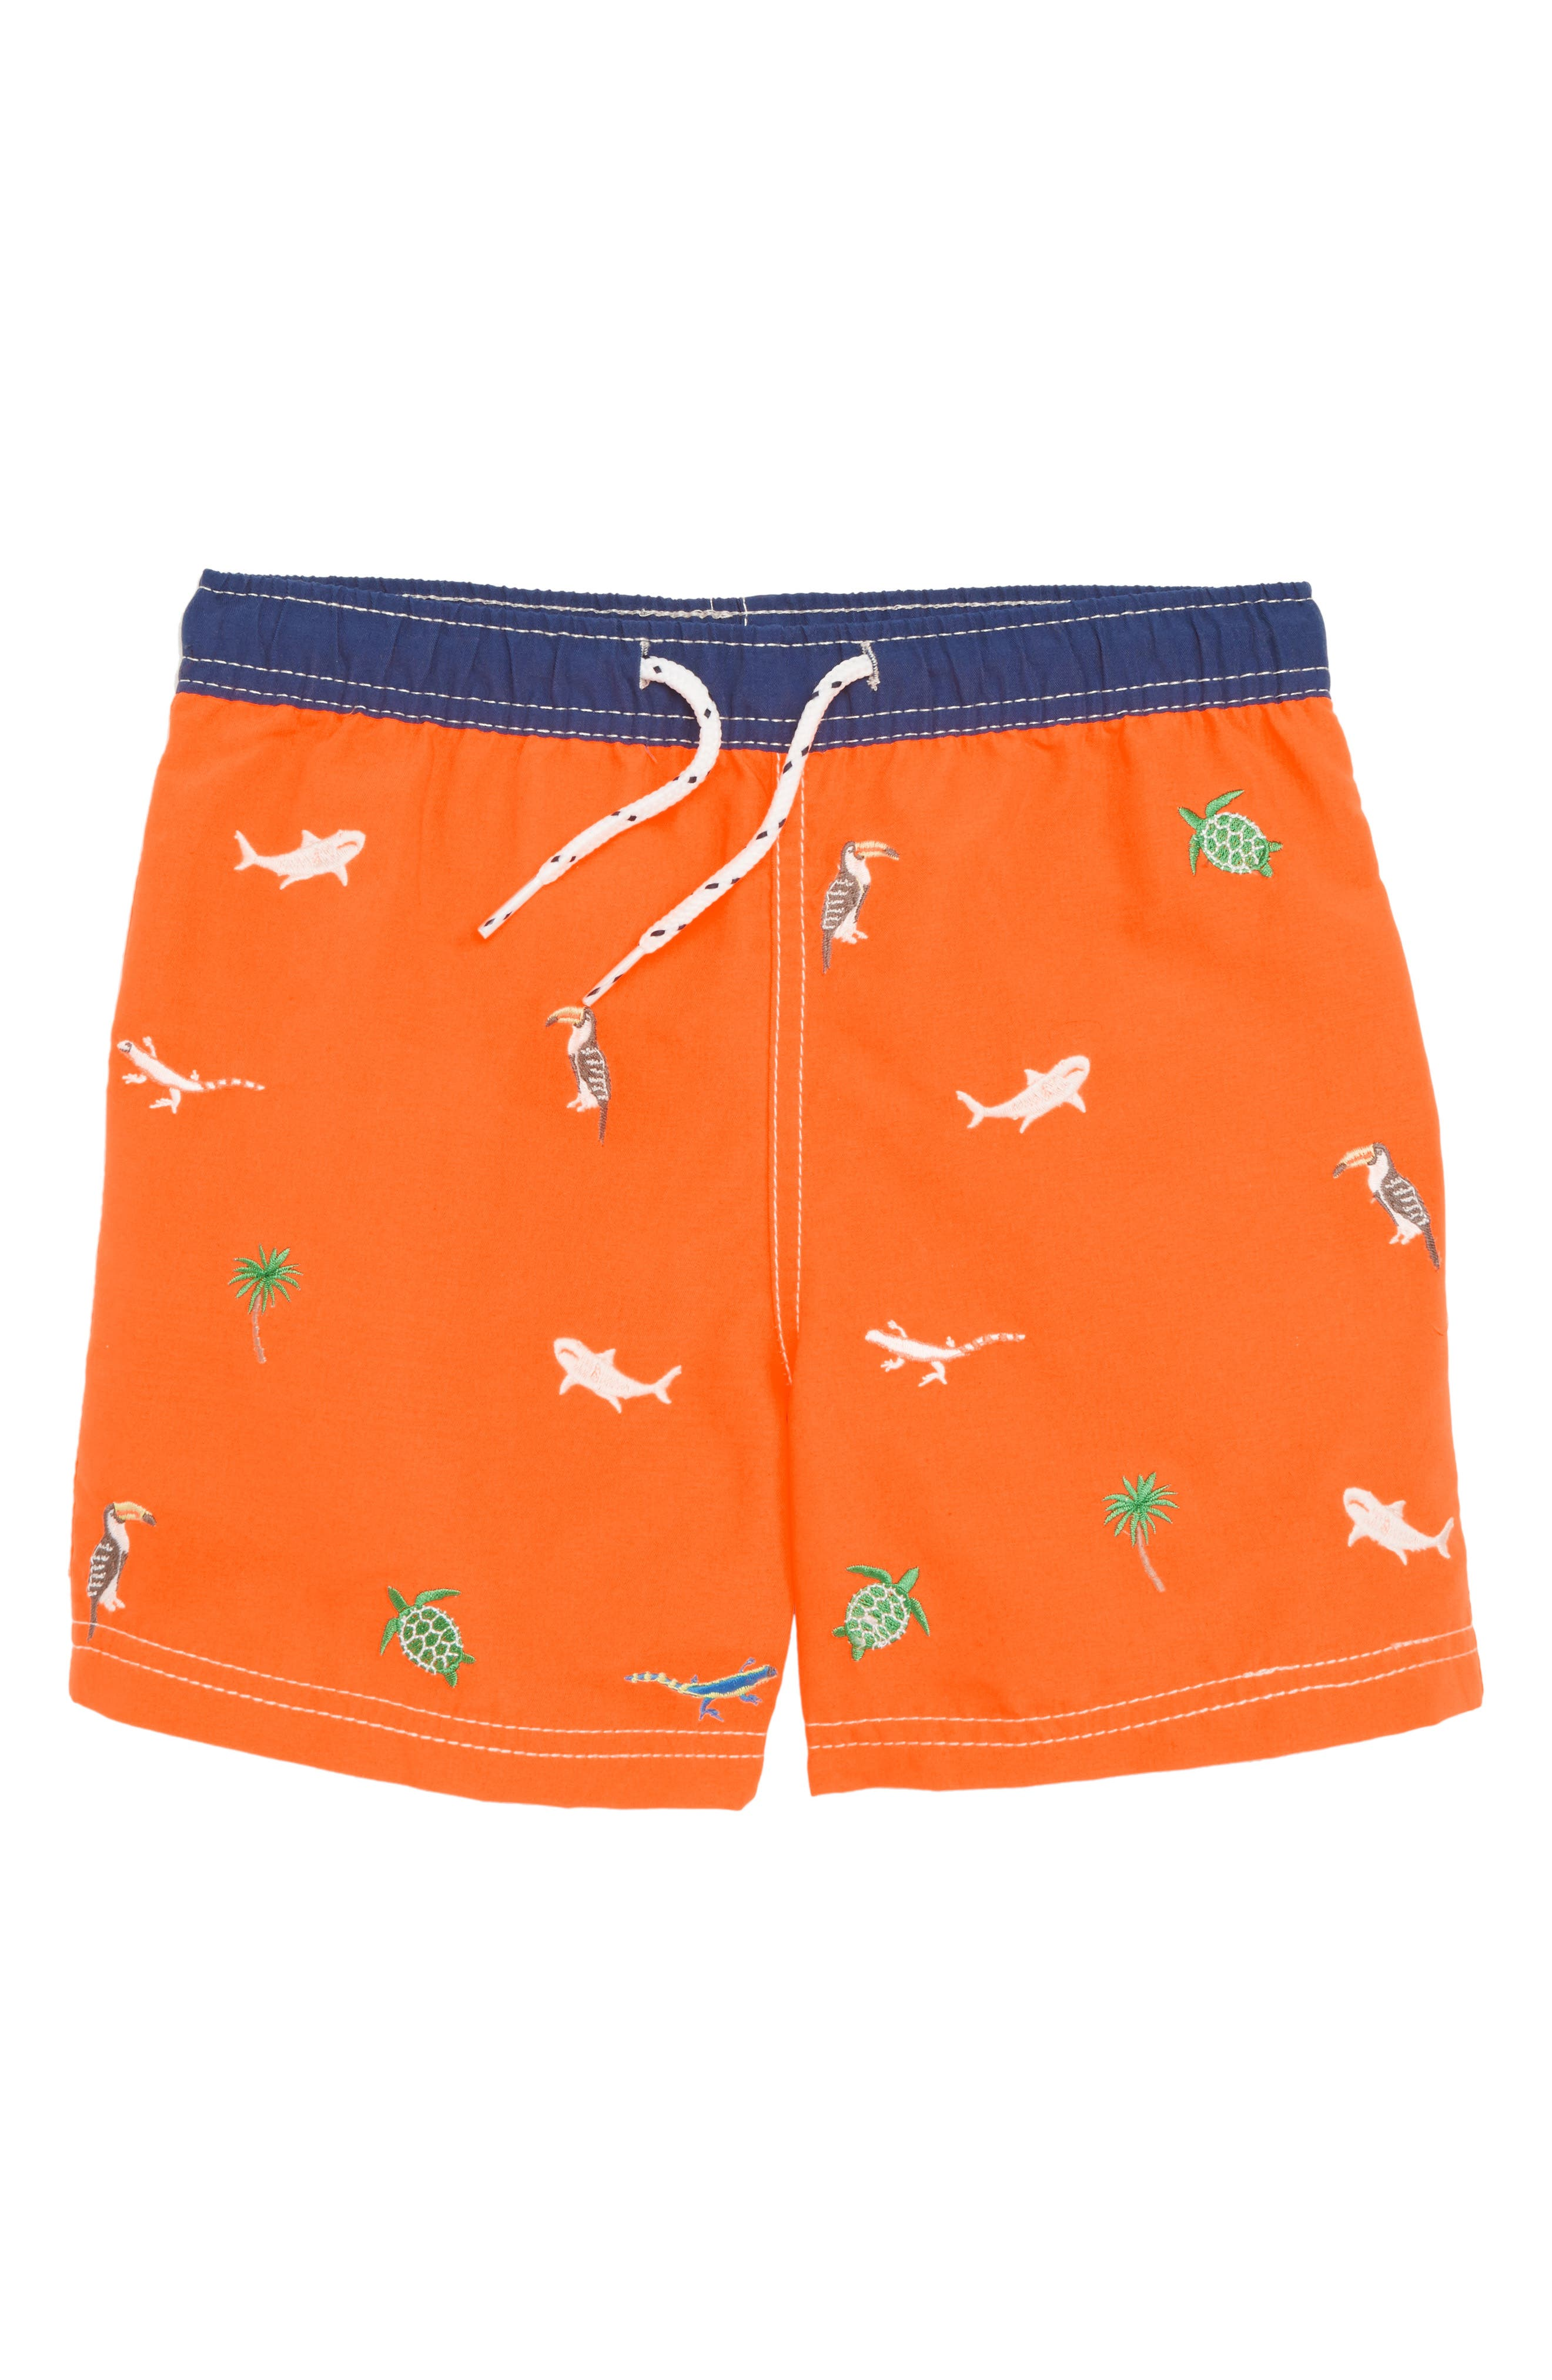 Main Image - Mini Boden Embroidered Swim Trunks (Toddler Boys, Little Boys & Big Boys)